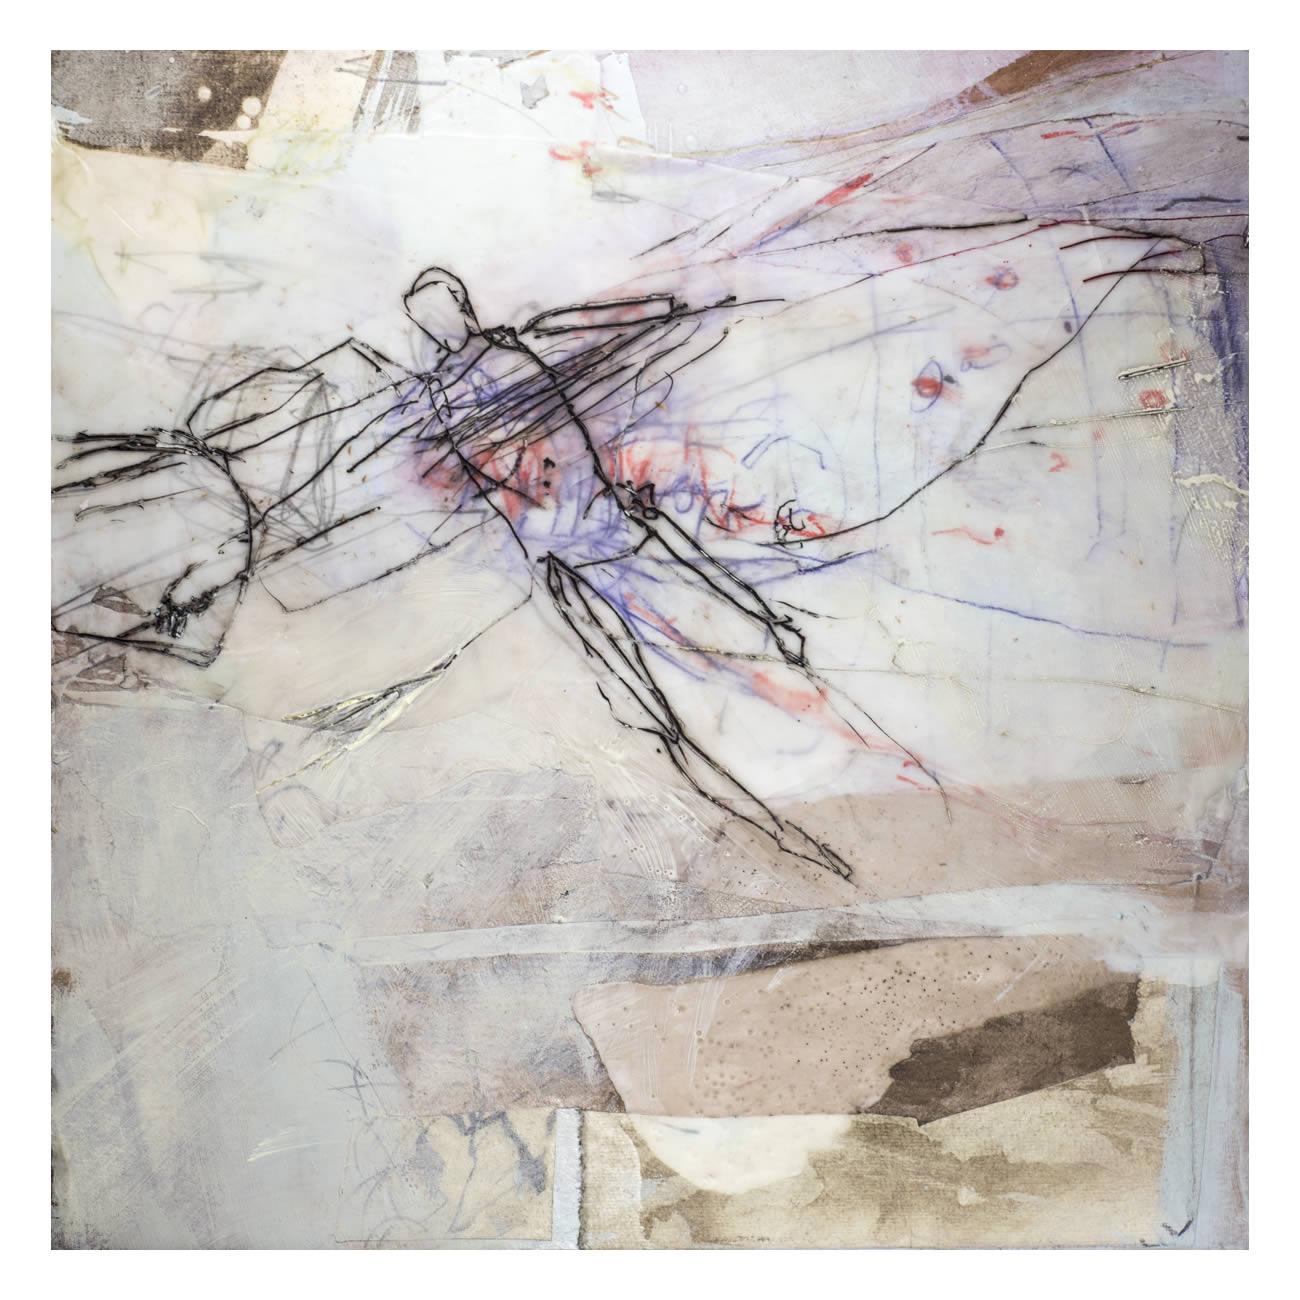 Andrea Rozorea - Galerie: Zeichnung unter Wachs - Salomon's Idee II